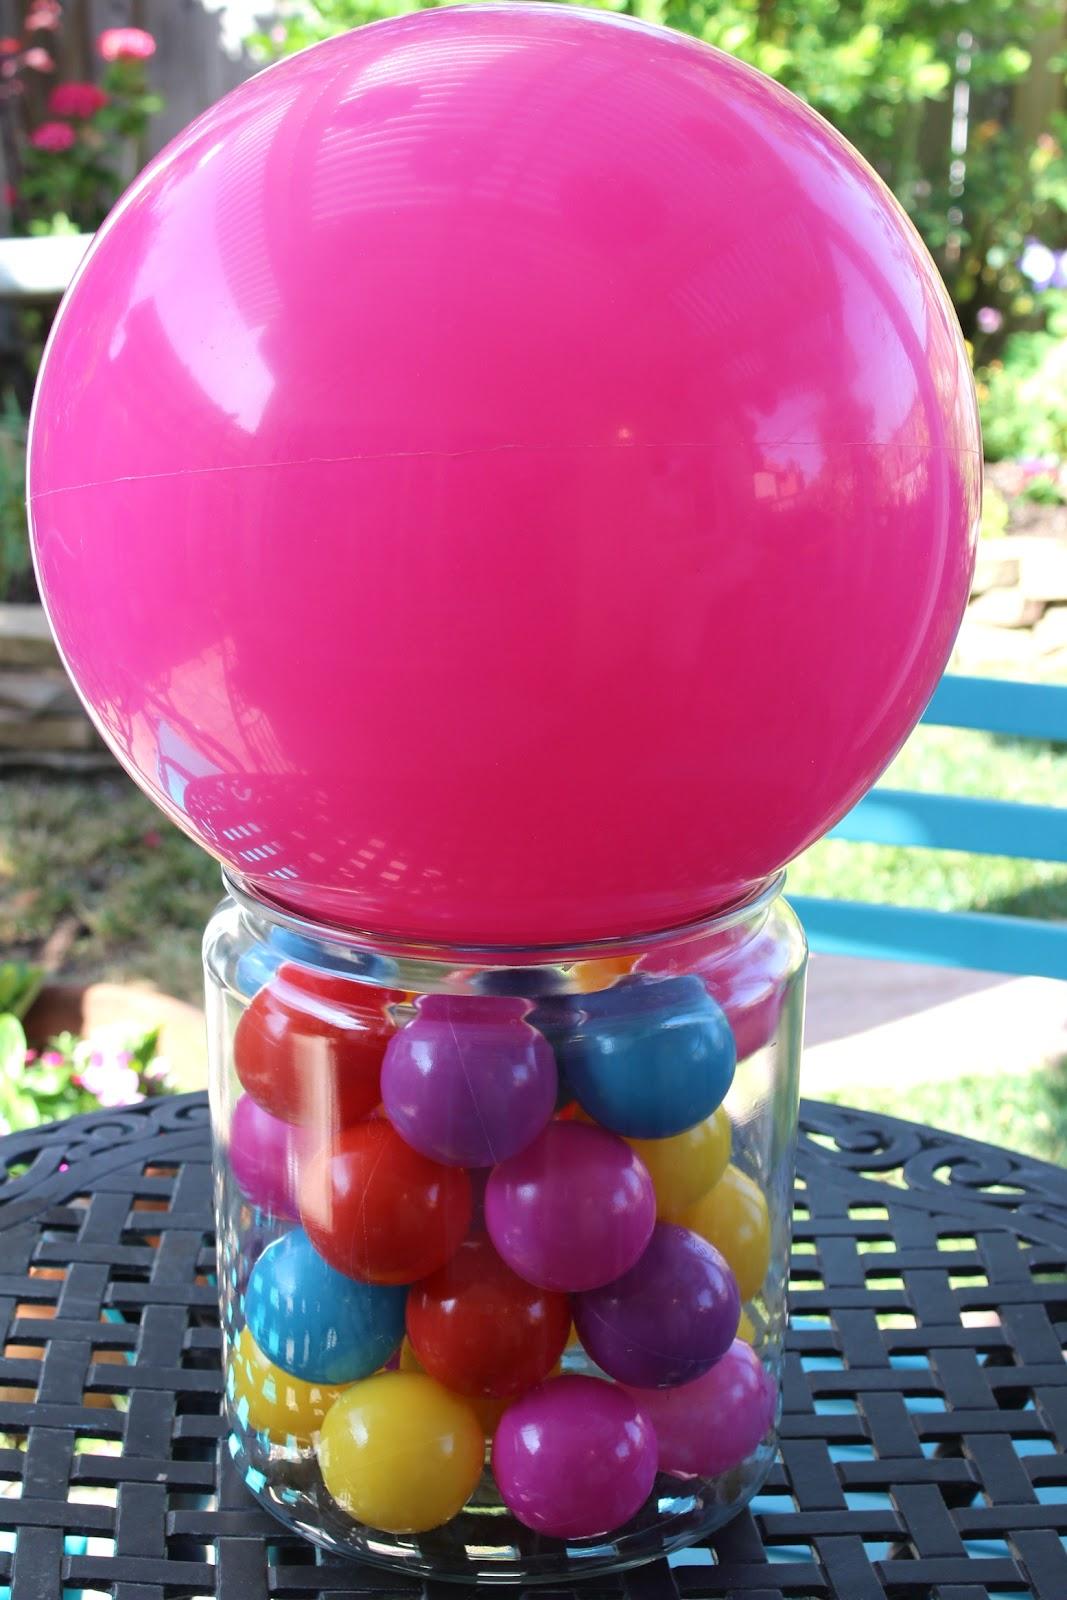 cheerful events  gavin u0026 39 s 2nd birthday bounce ball party